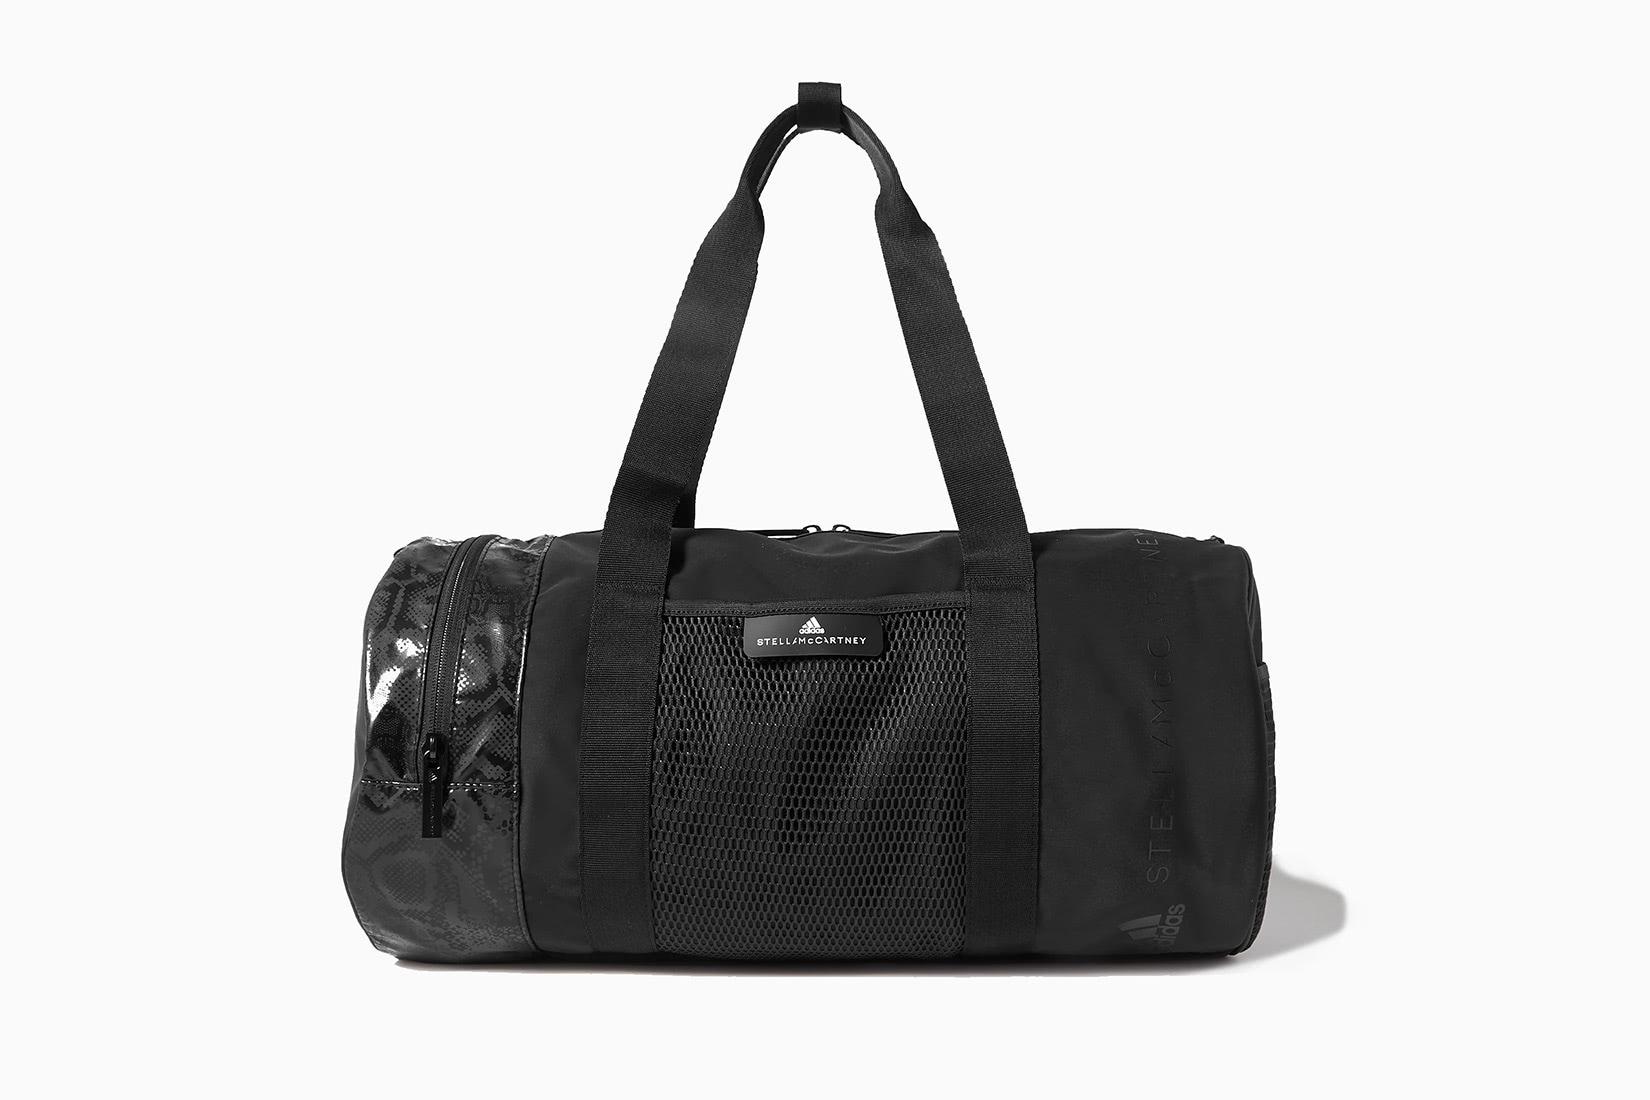 best women gym bag office duffle adidas stella mccartney - Luxe Digital